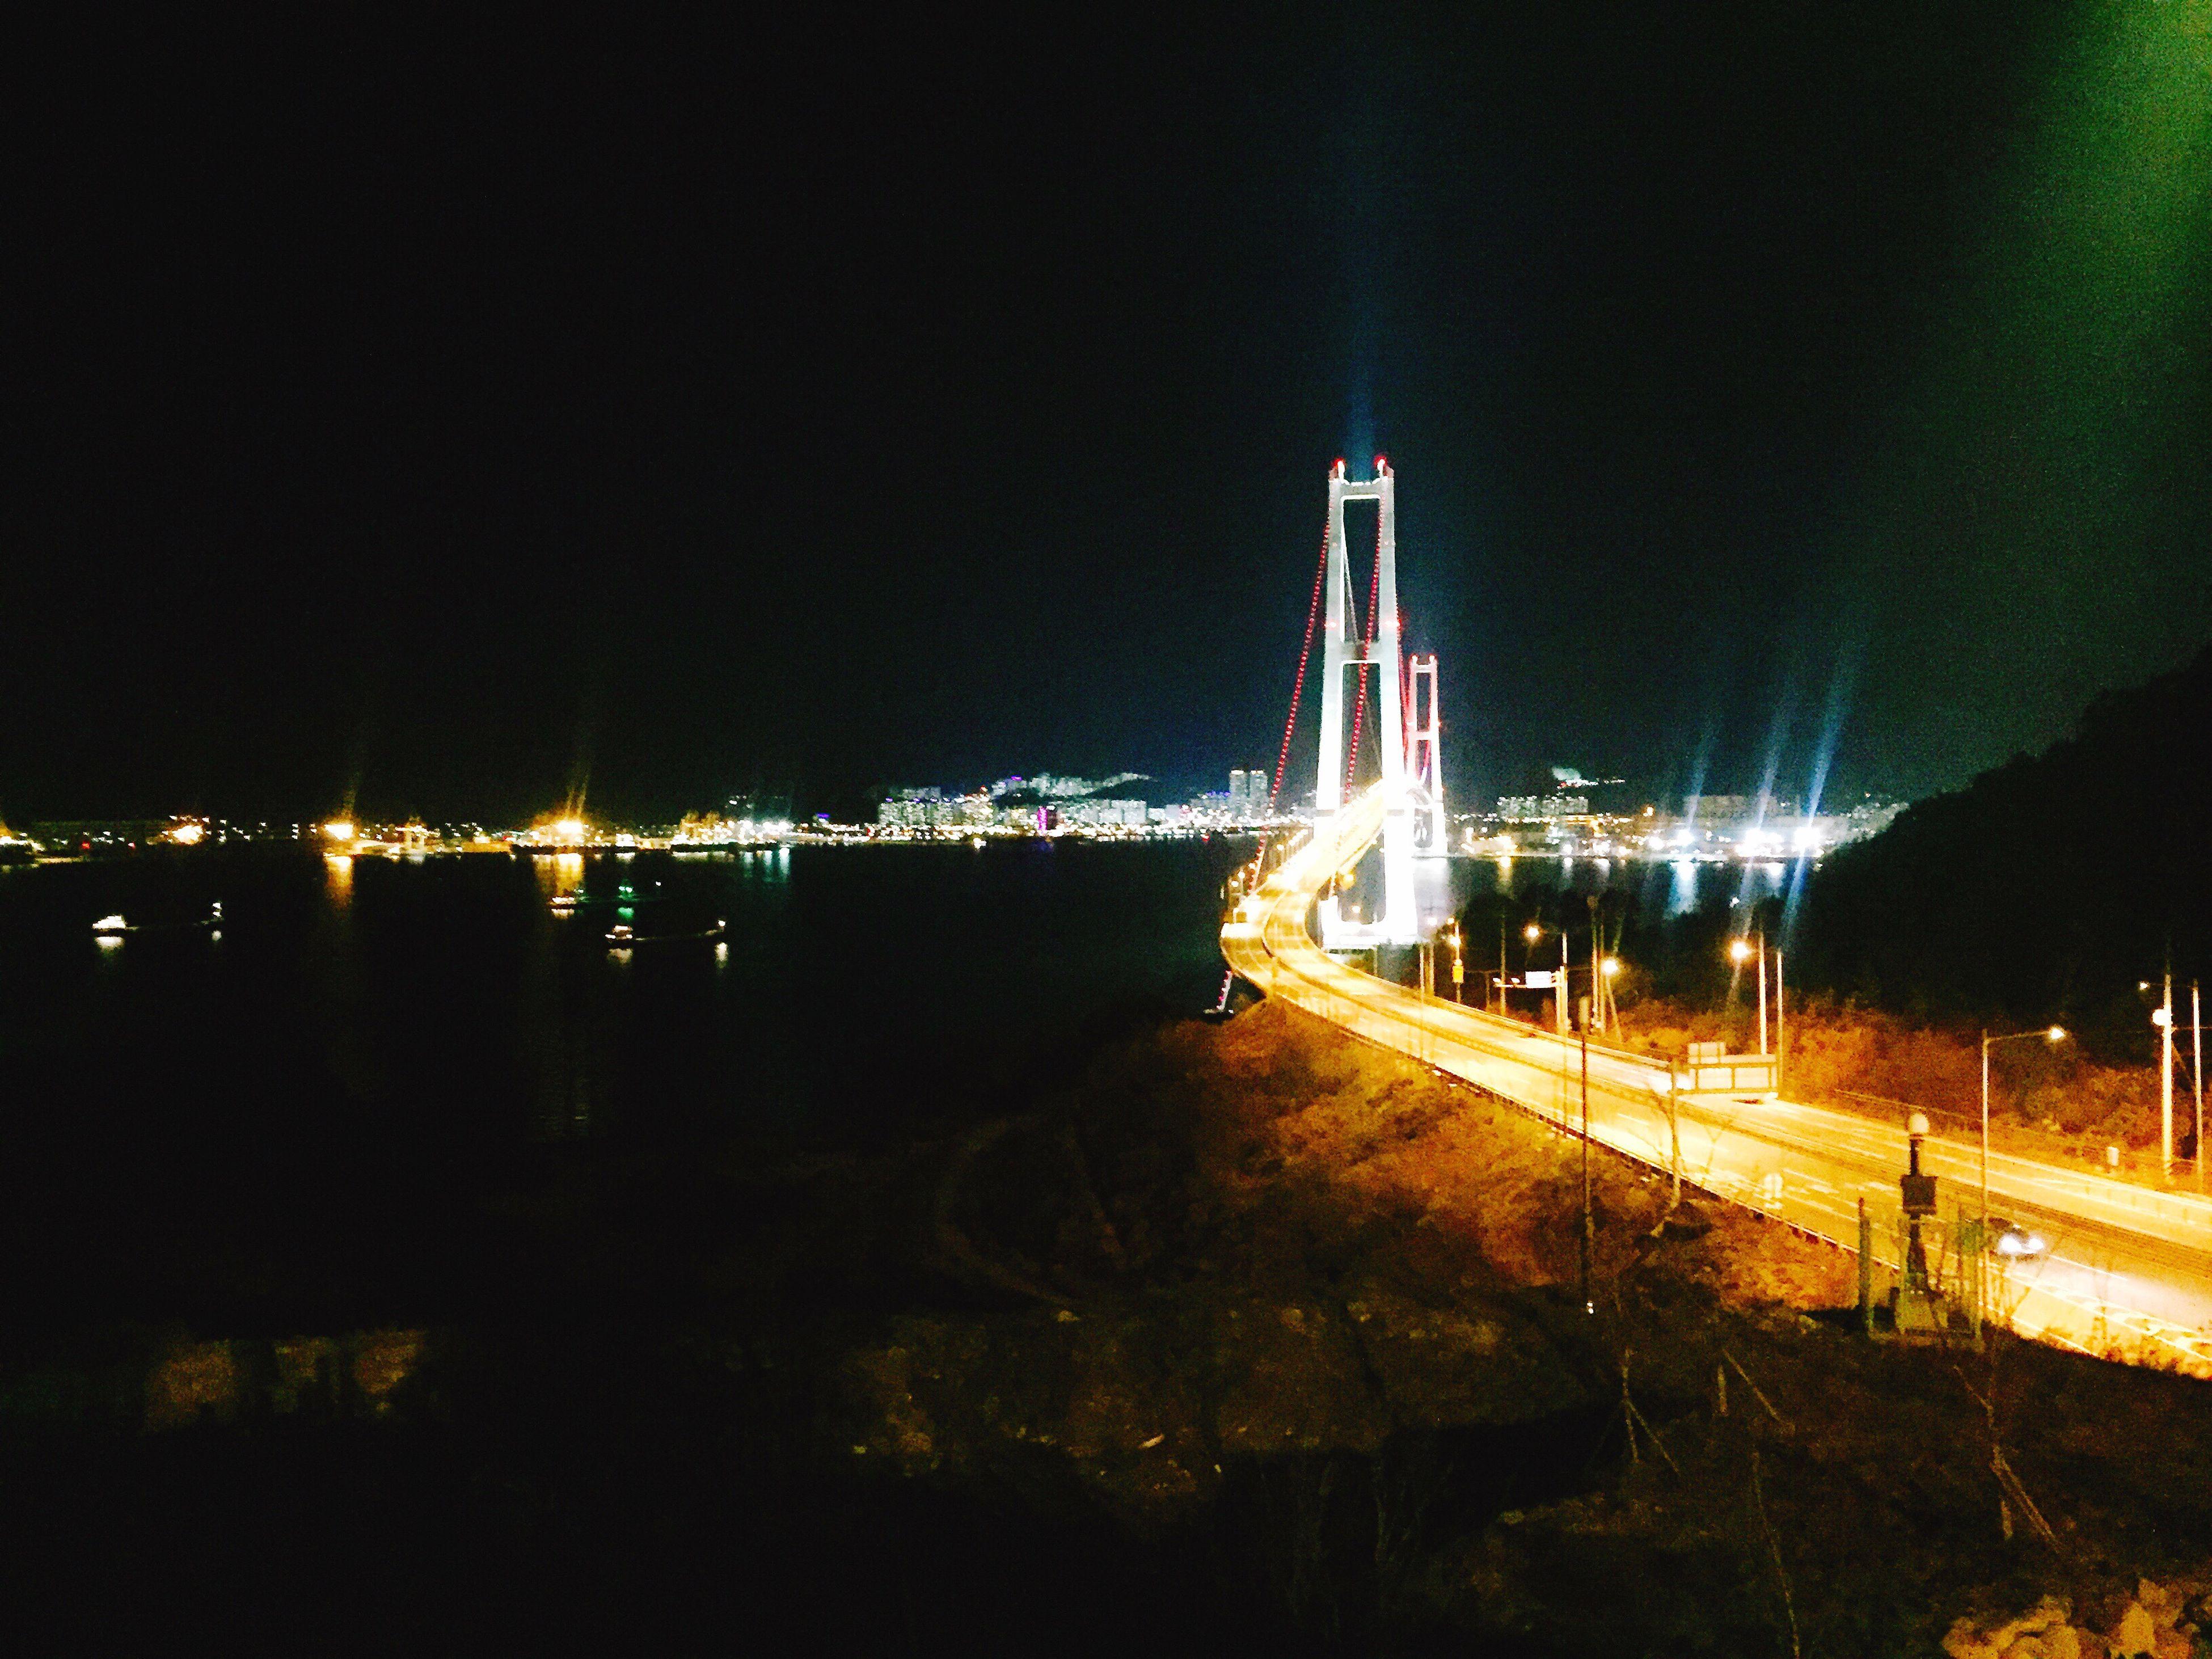 night, illuminated, transportation, light trail, no people, outdoors, road, sky